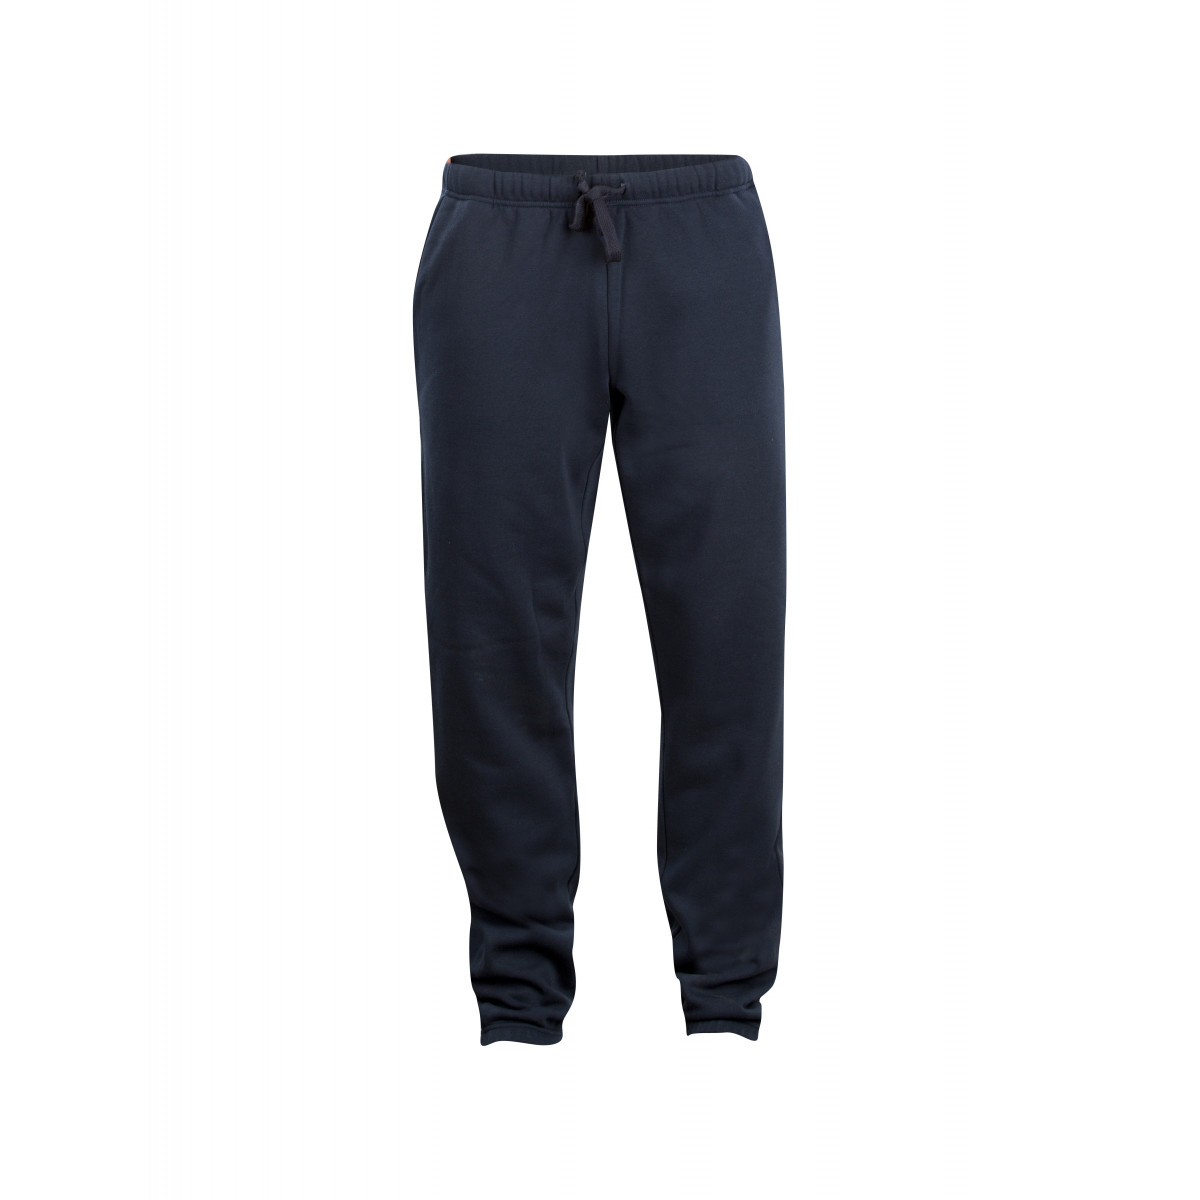 Брюки детские 021027 Basic Pants Junior - Темно-синий